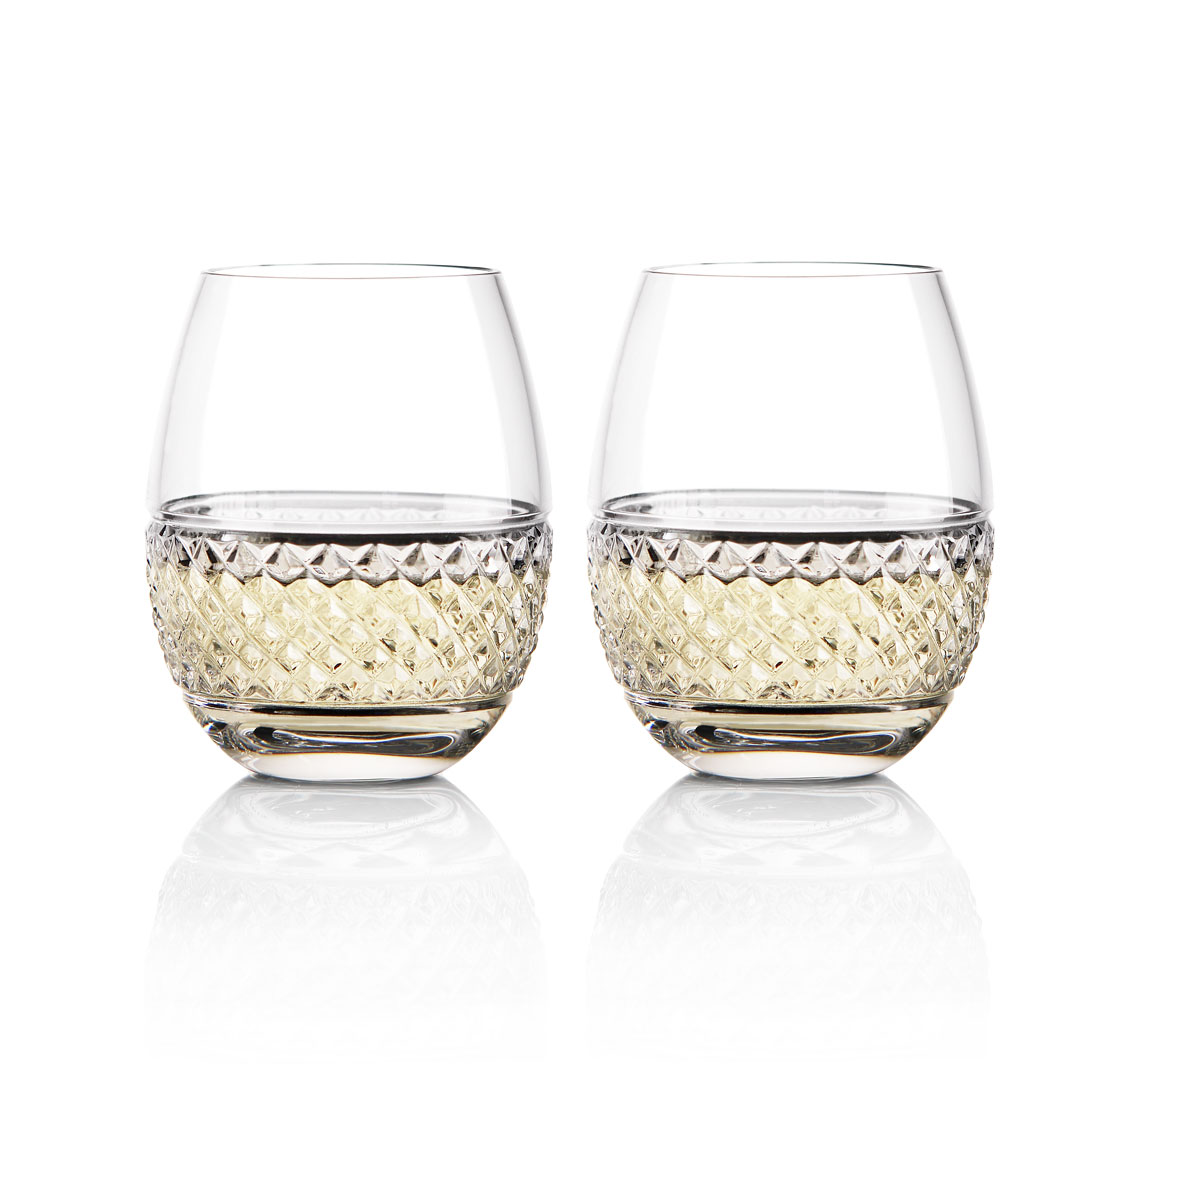 Cashs Ireland Cooper Stemless White Wine Glasses, 1+1 Free